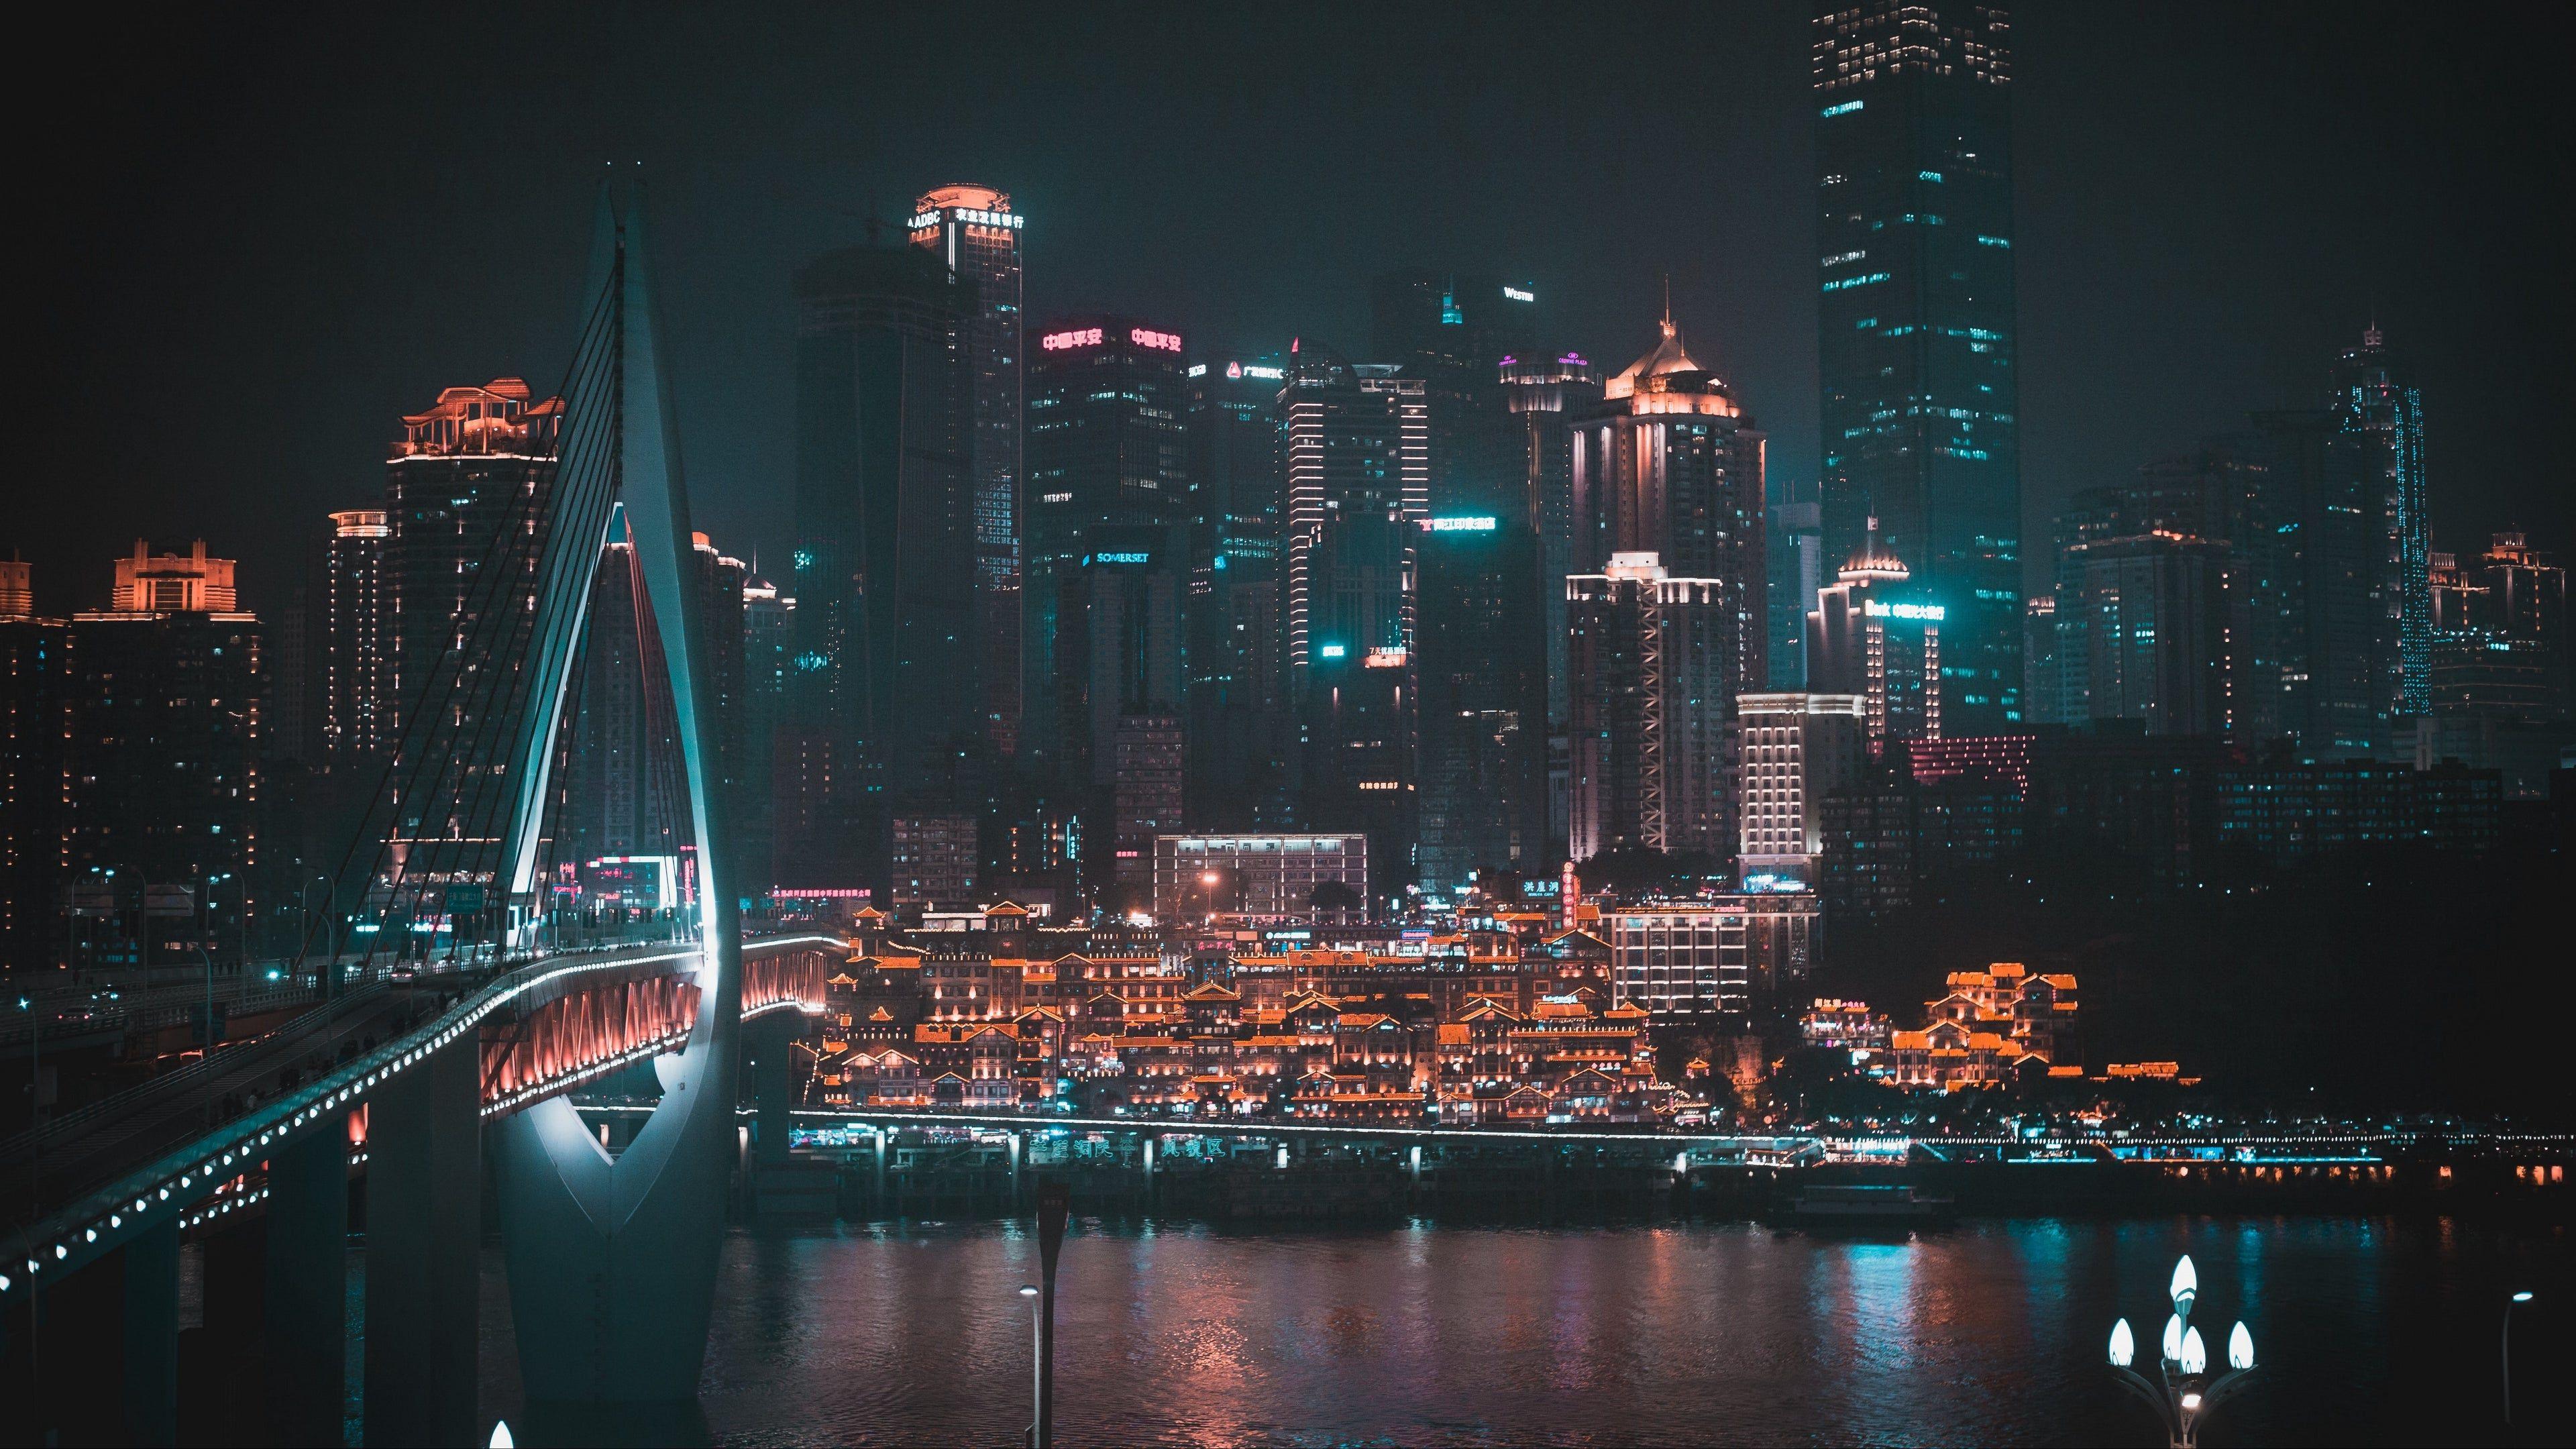 Night City Buildings 4k Wallpaper Night City Photo Nightscape